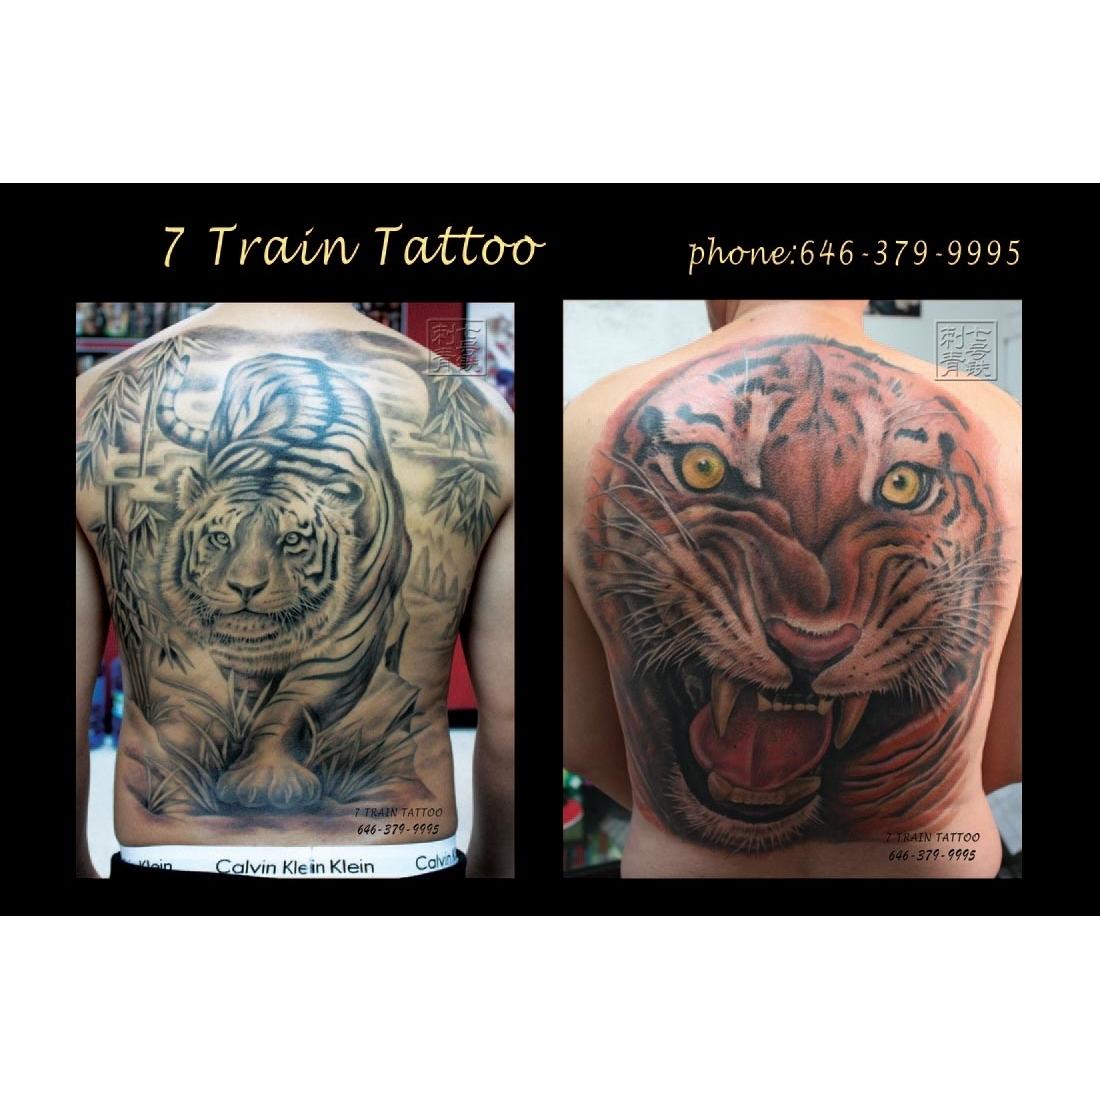 7 train tattoo studio inc flushing ny company page for Studio 7 tattoo